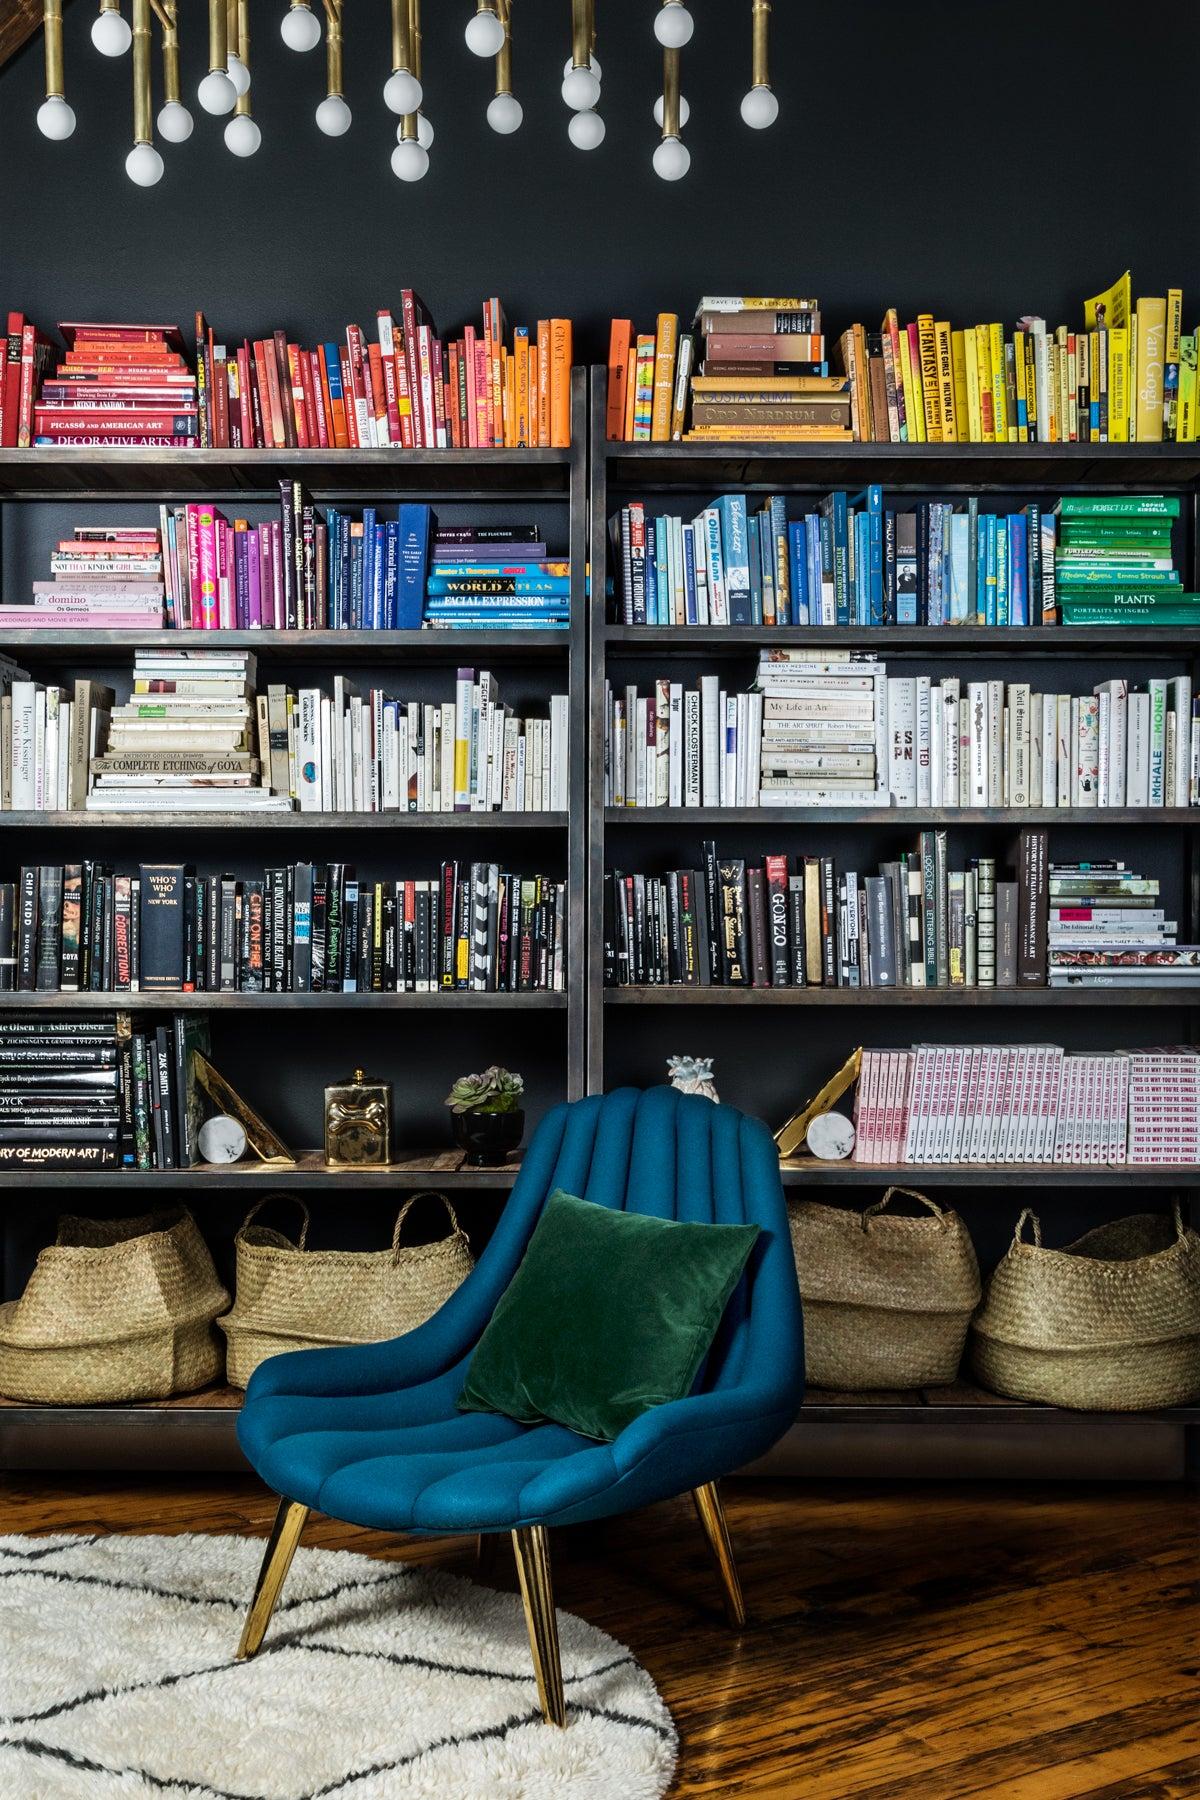 01_bookshelf_photo_by_CodyGuilfoyle